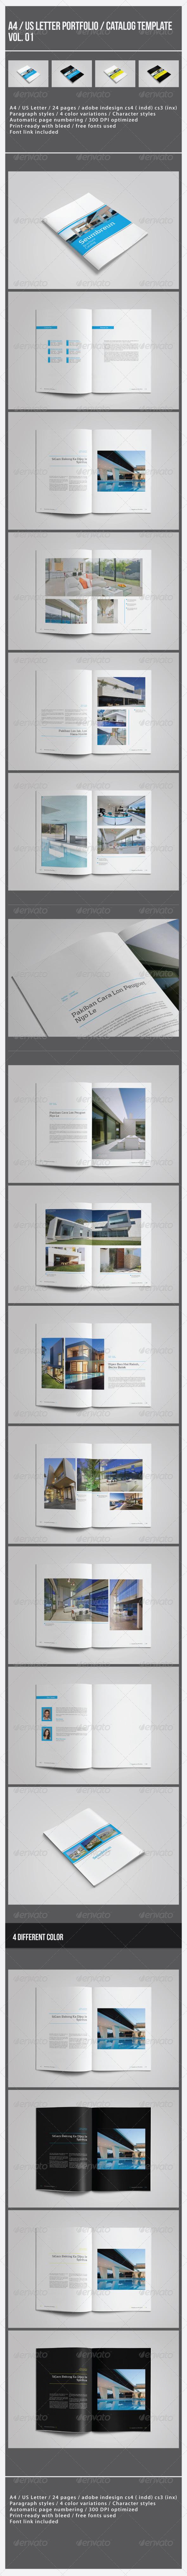 GraphicRiver Portrait Portfolio Catalog Template Vol 01 8562975